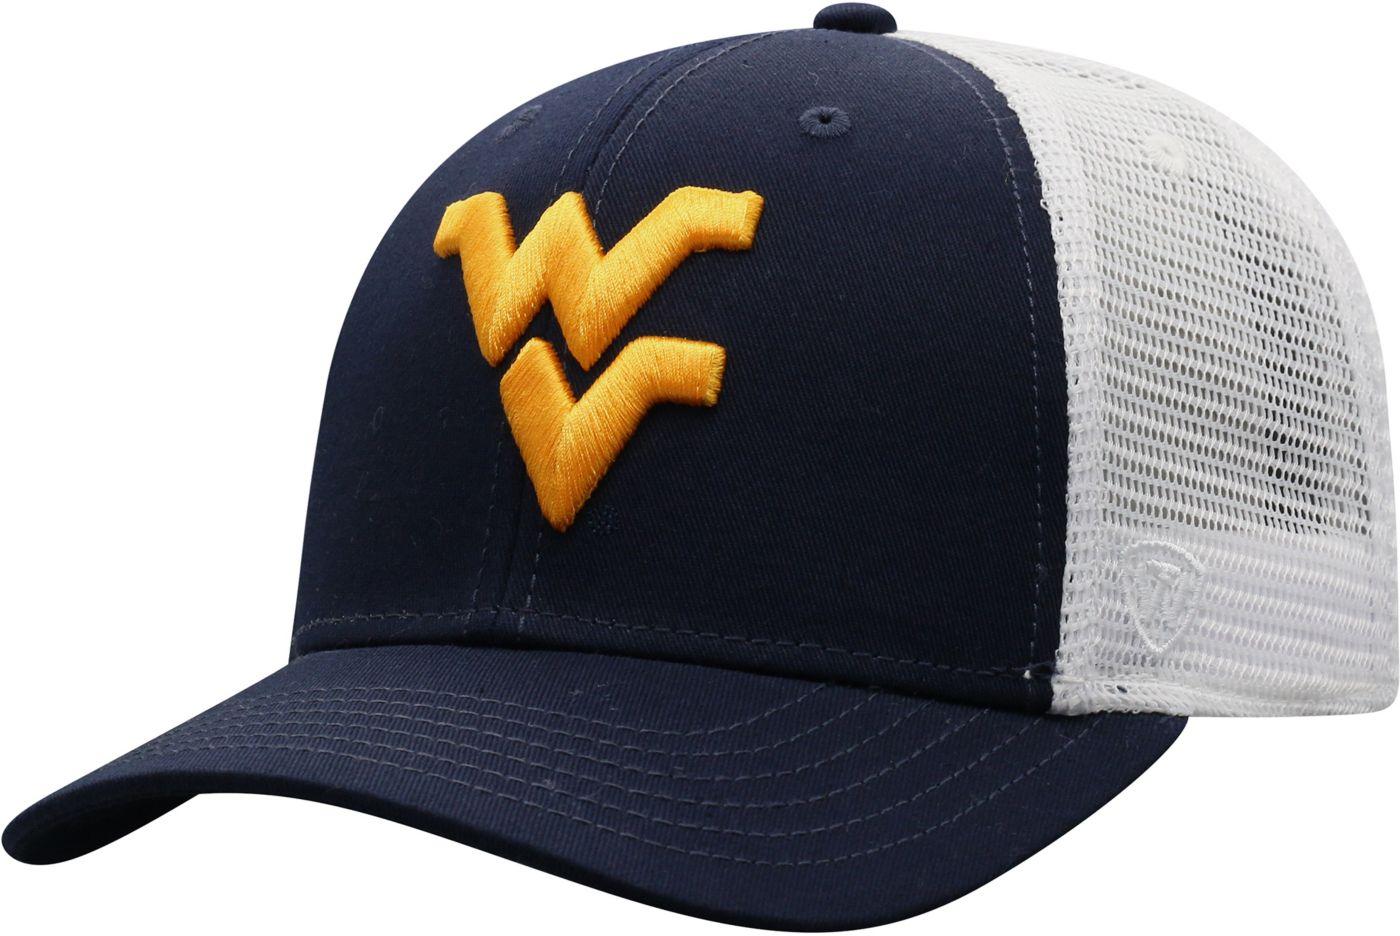 Top of the World Men's West Virginia Mountaineers Blue/White Trucker Adjustable Hat